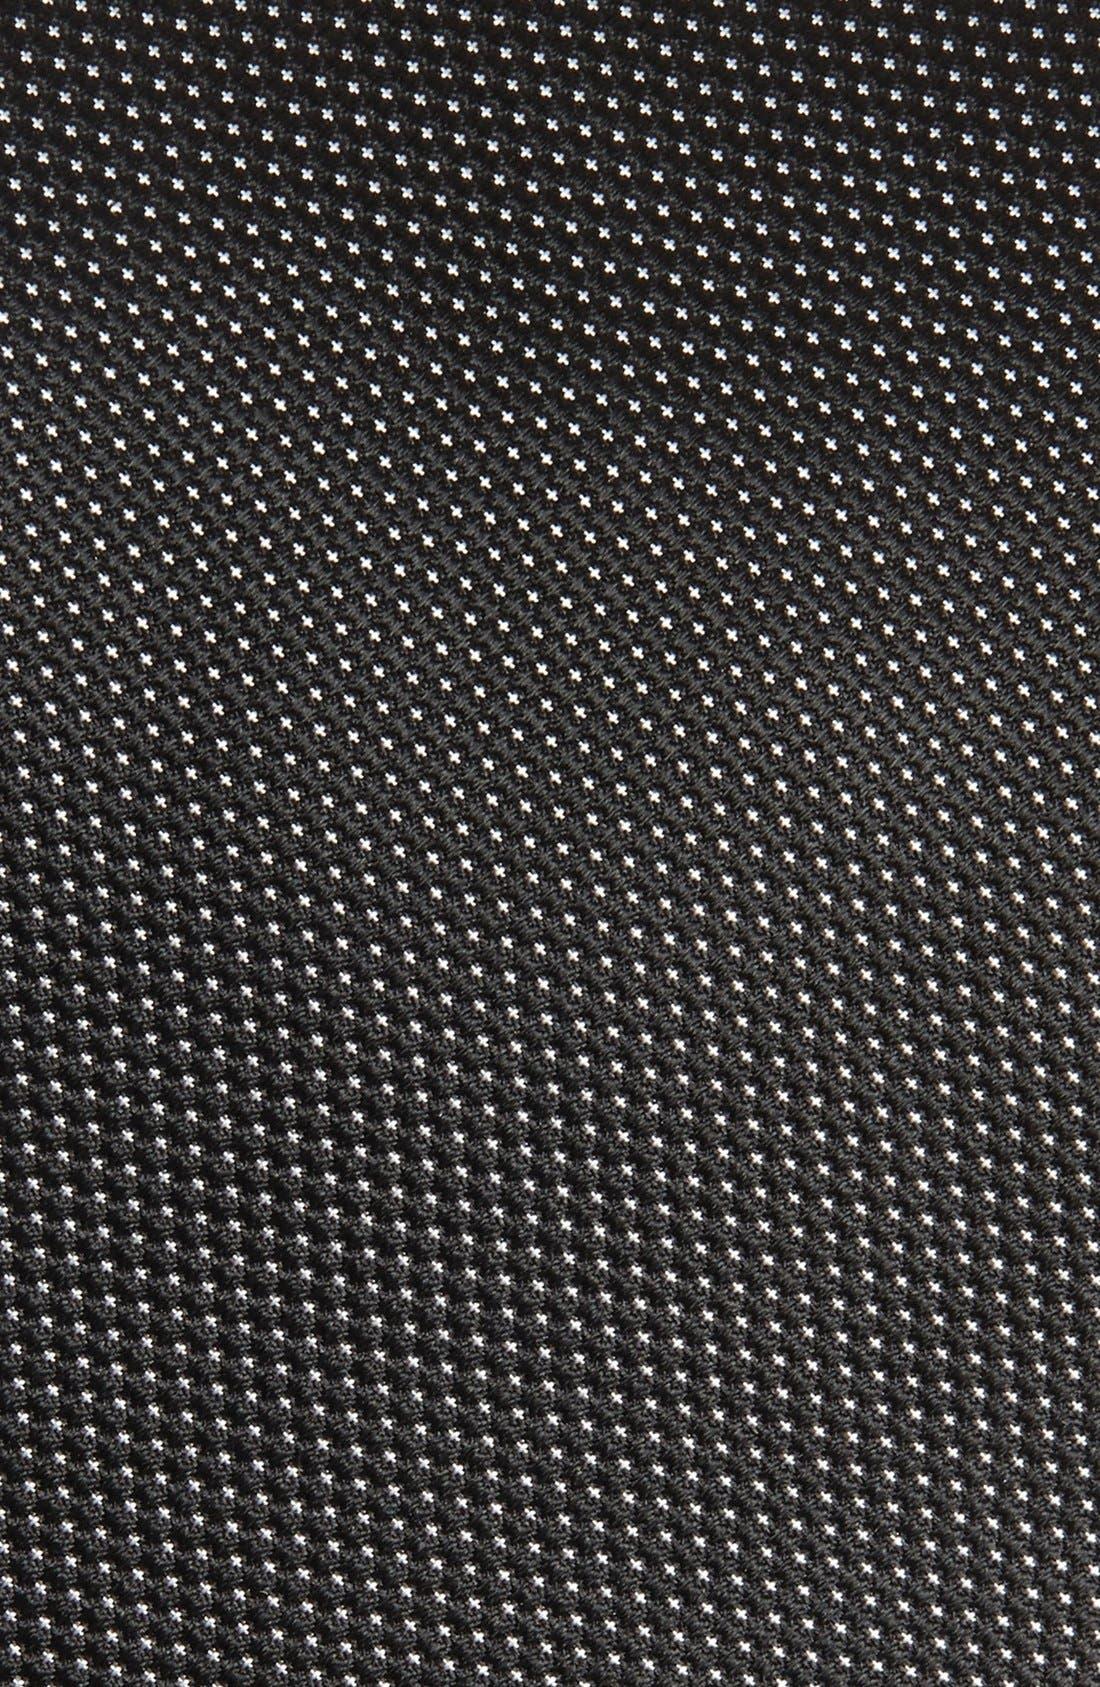 Microdot Silk Tie,                             Alternate thumbnail 3, color,                             BLACK